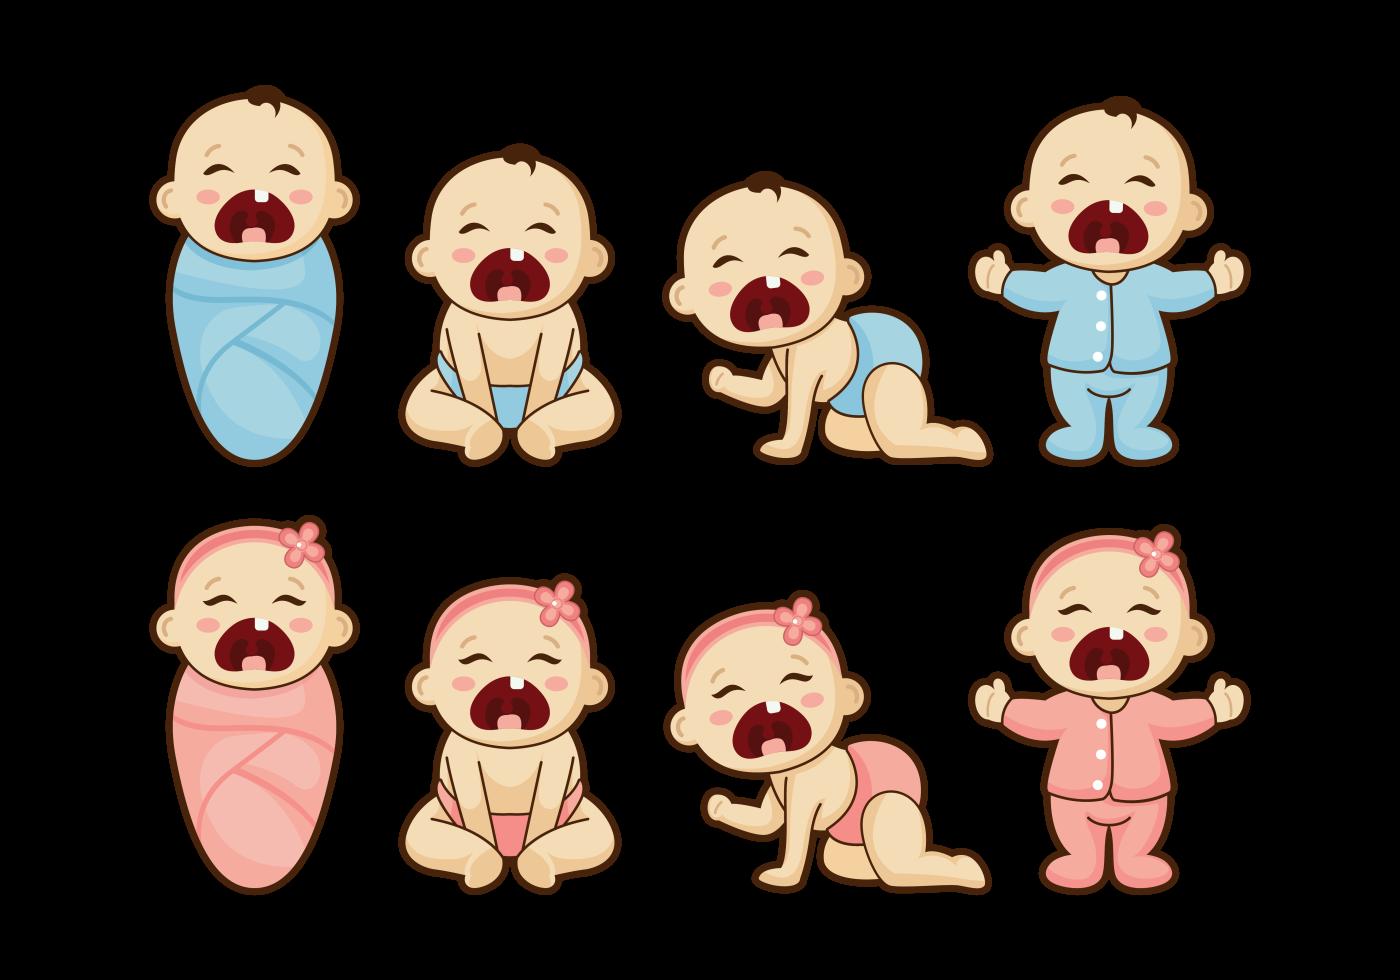 Cry Baby Cartoon | www.imgkid.com - The Image Kid Has It!